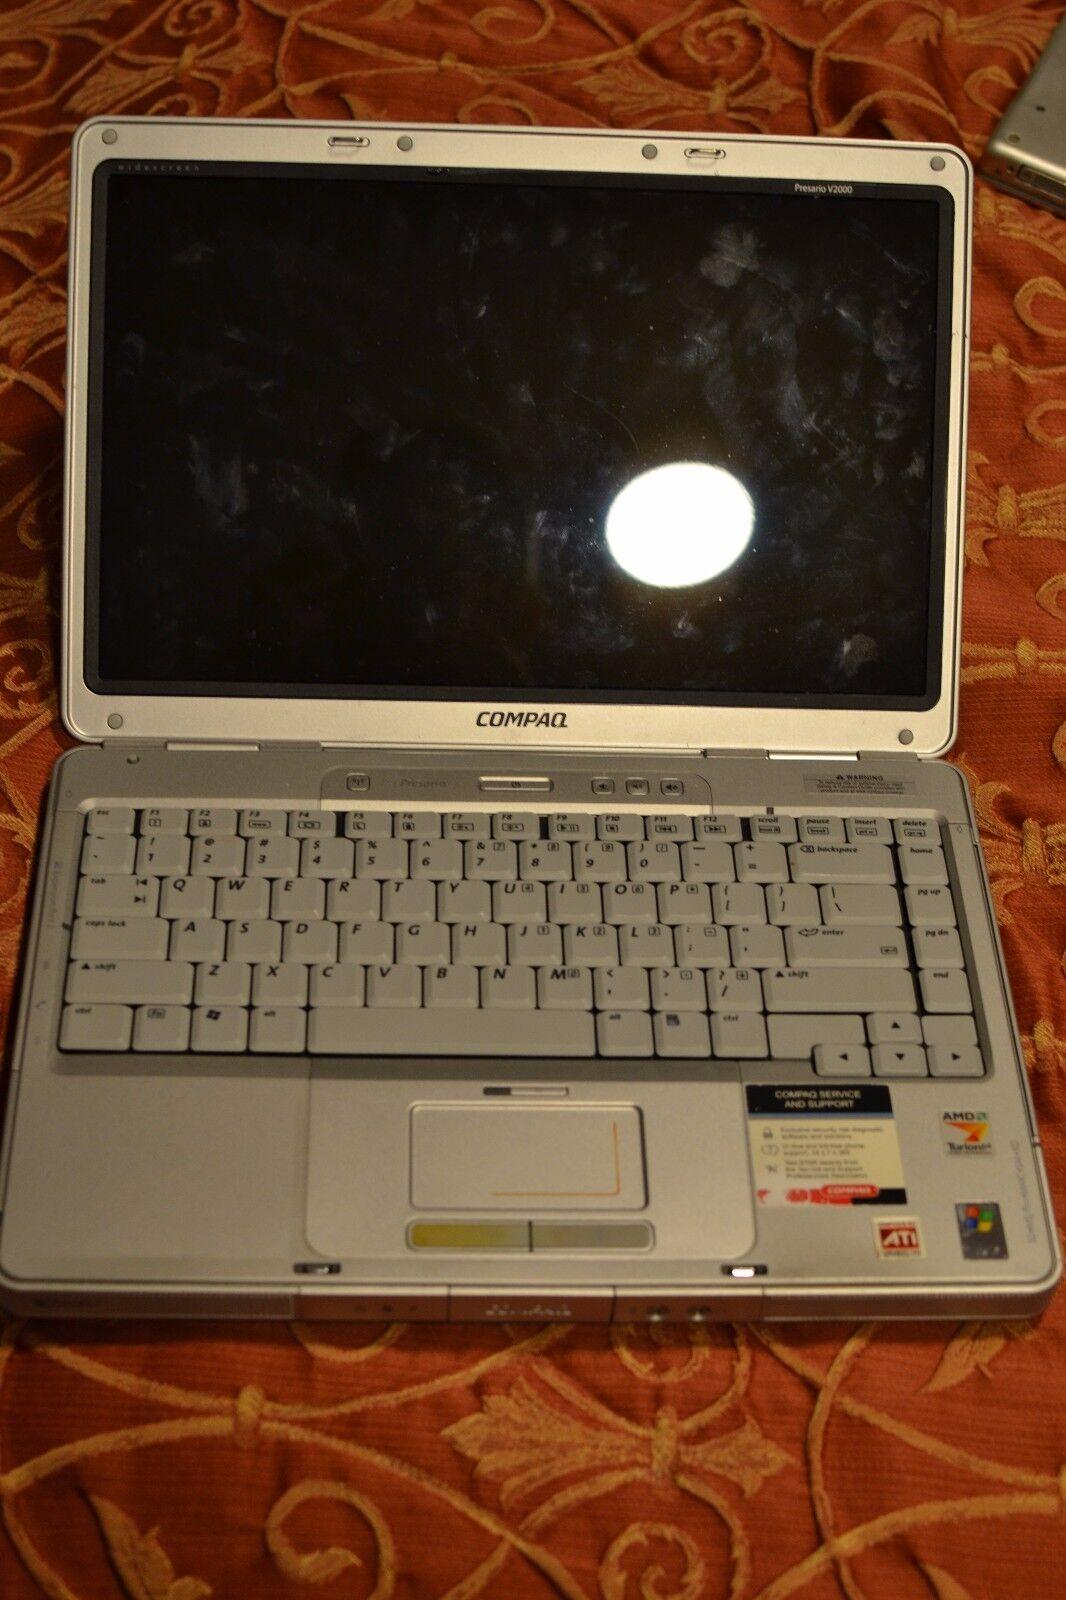 "Compaq Presario 14"" V2000 Celeron M 1 4GHz/60Gb/1Gb/CDRW/DVD/XP Home SP3 TESTED"